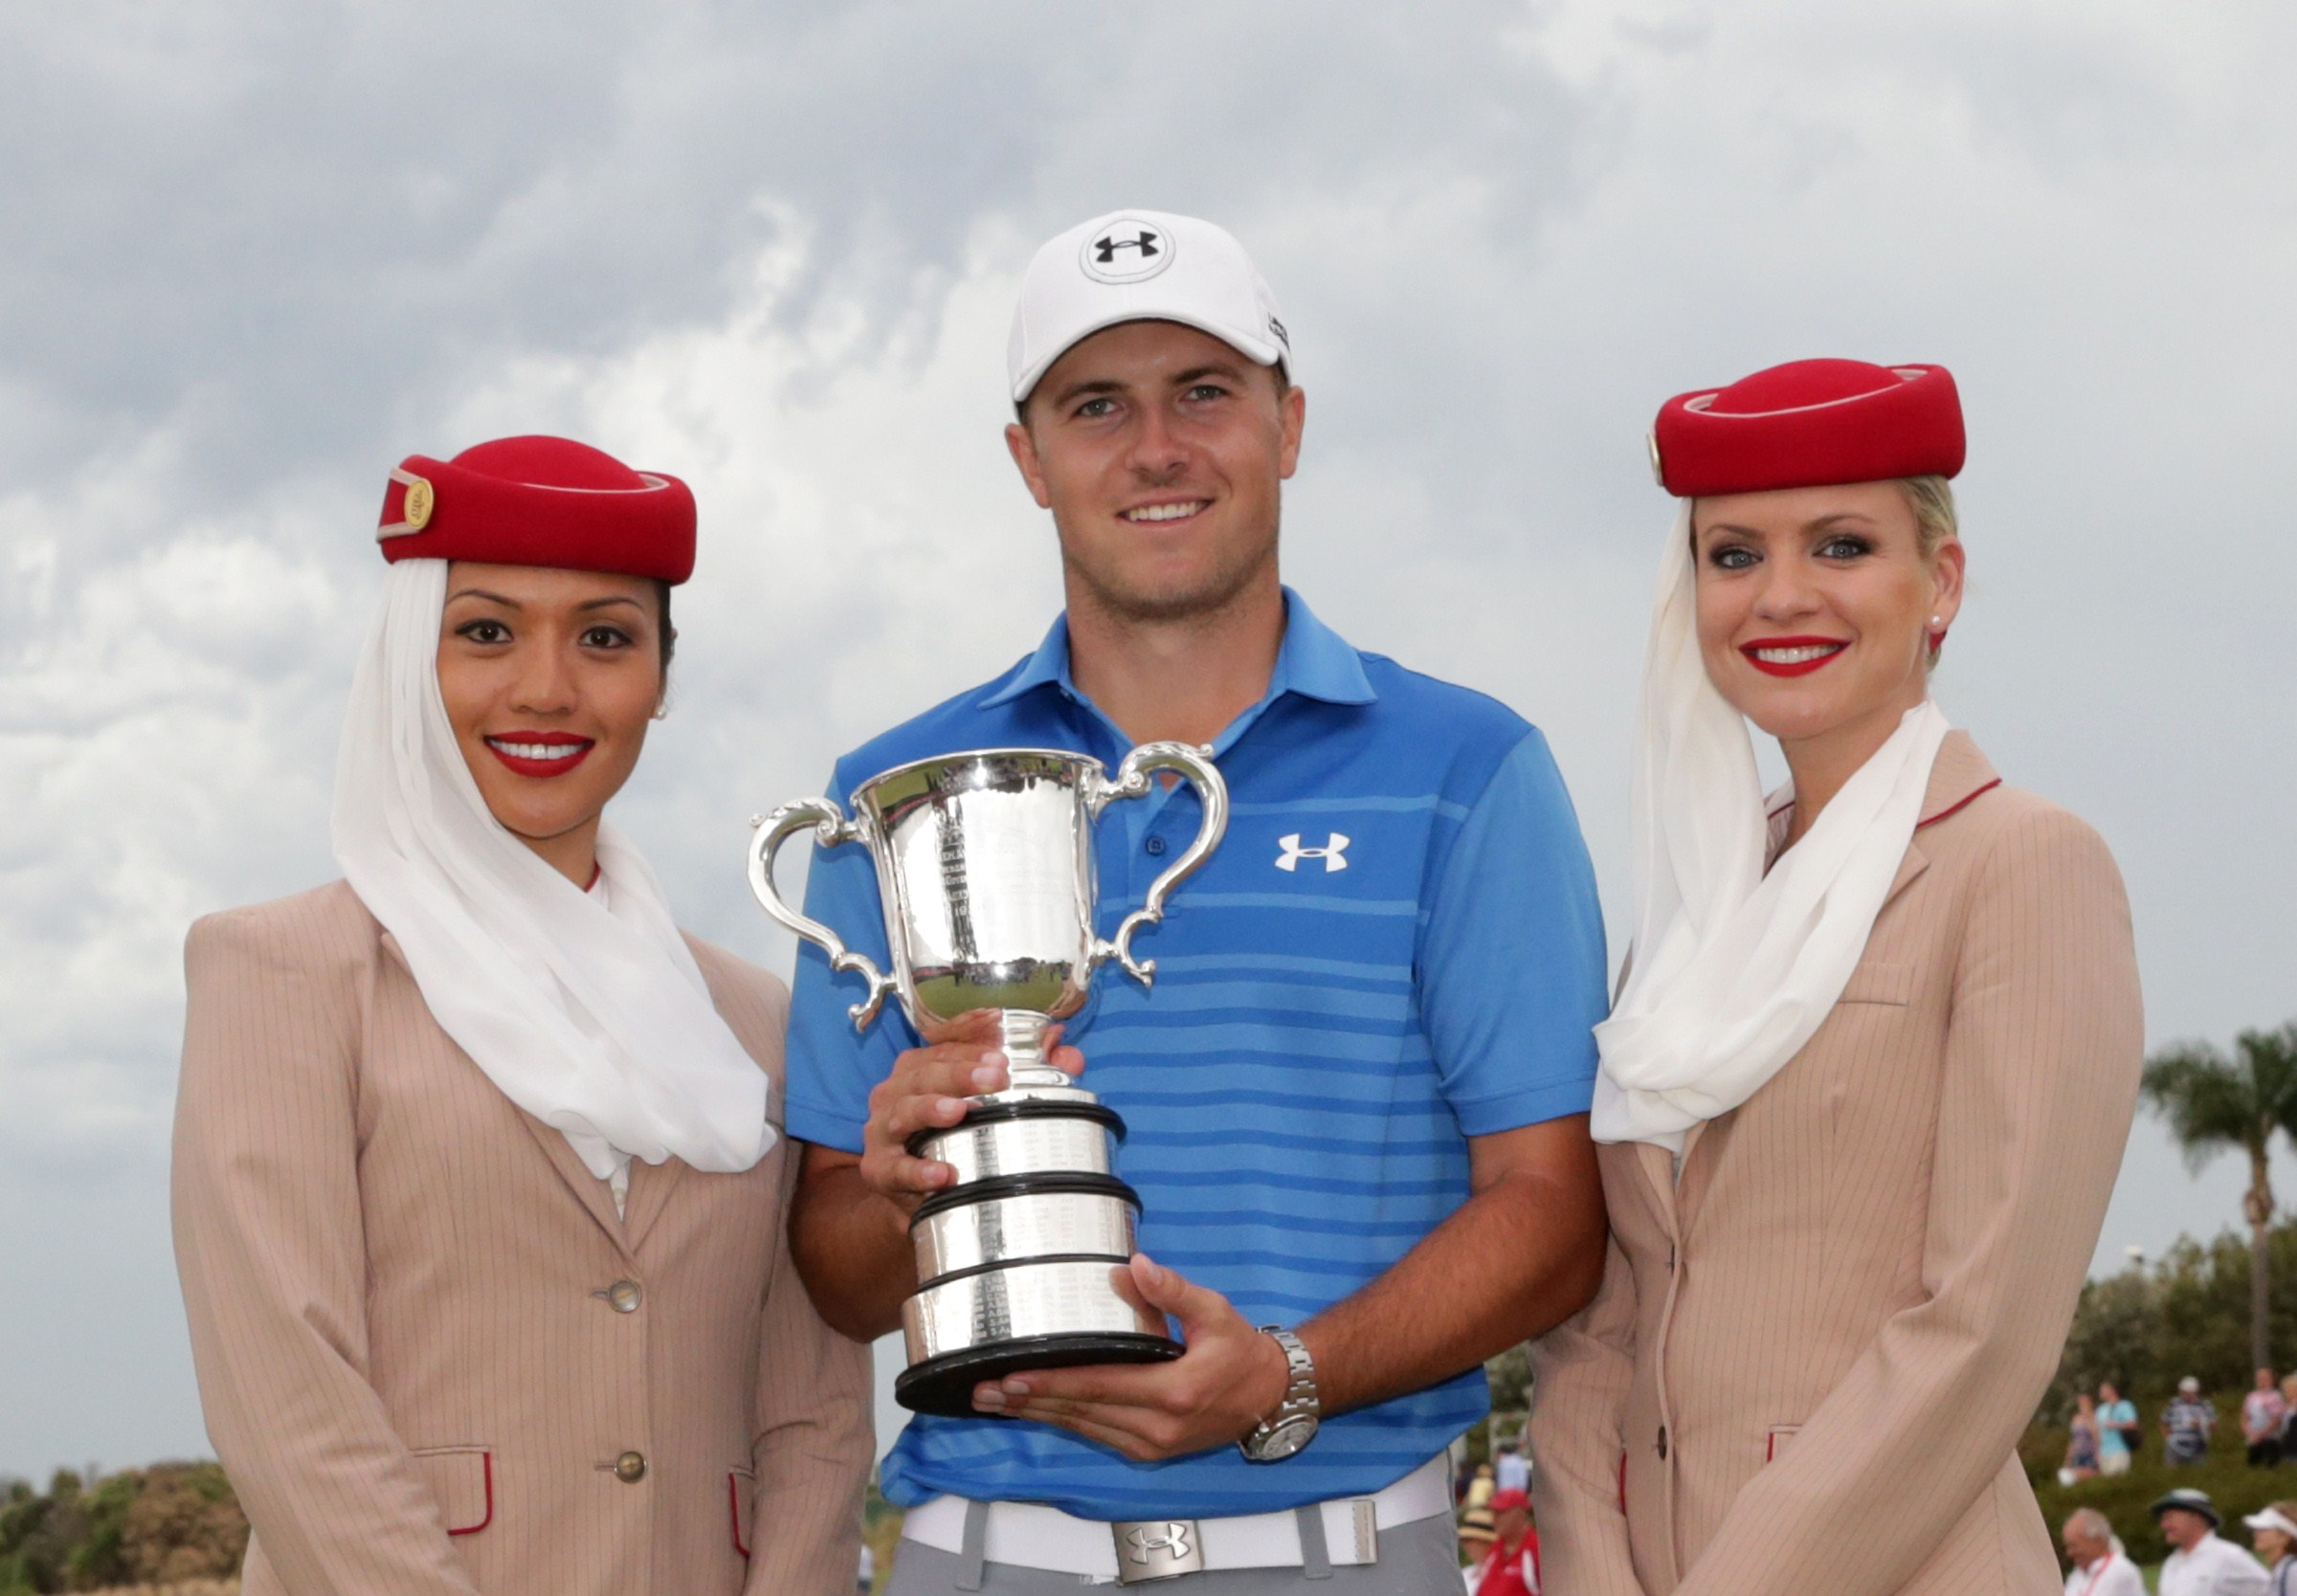 Emirates Australian Open 2014 Champion Jordan Spieth